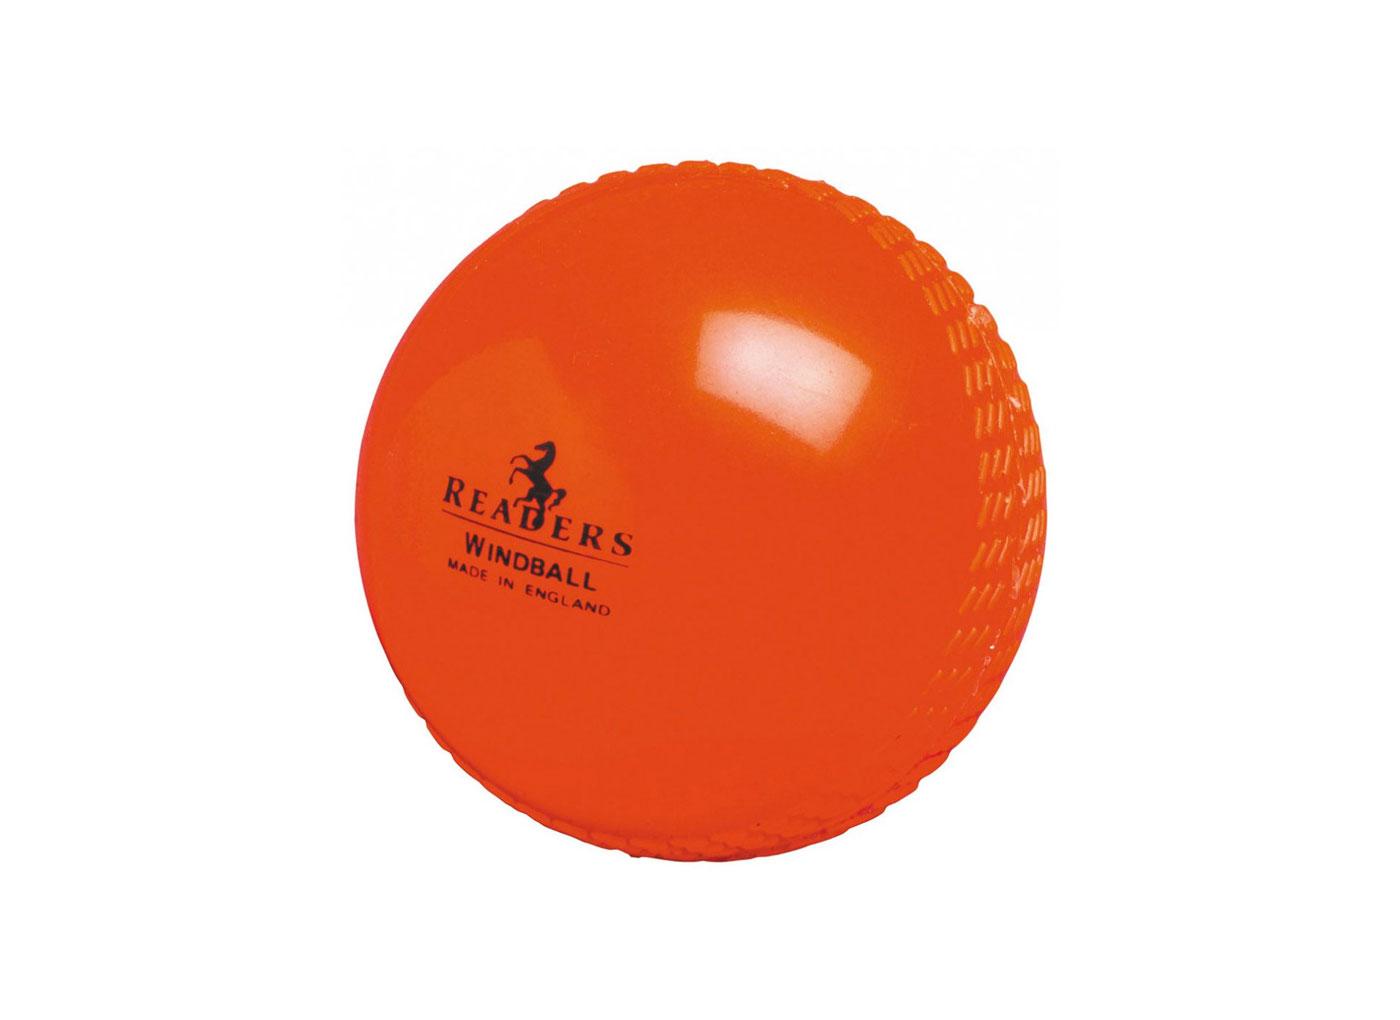 Readers Cricket Windball Orange